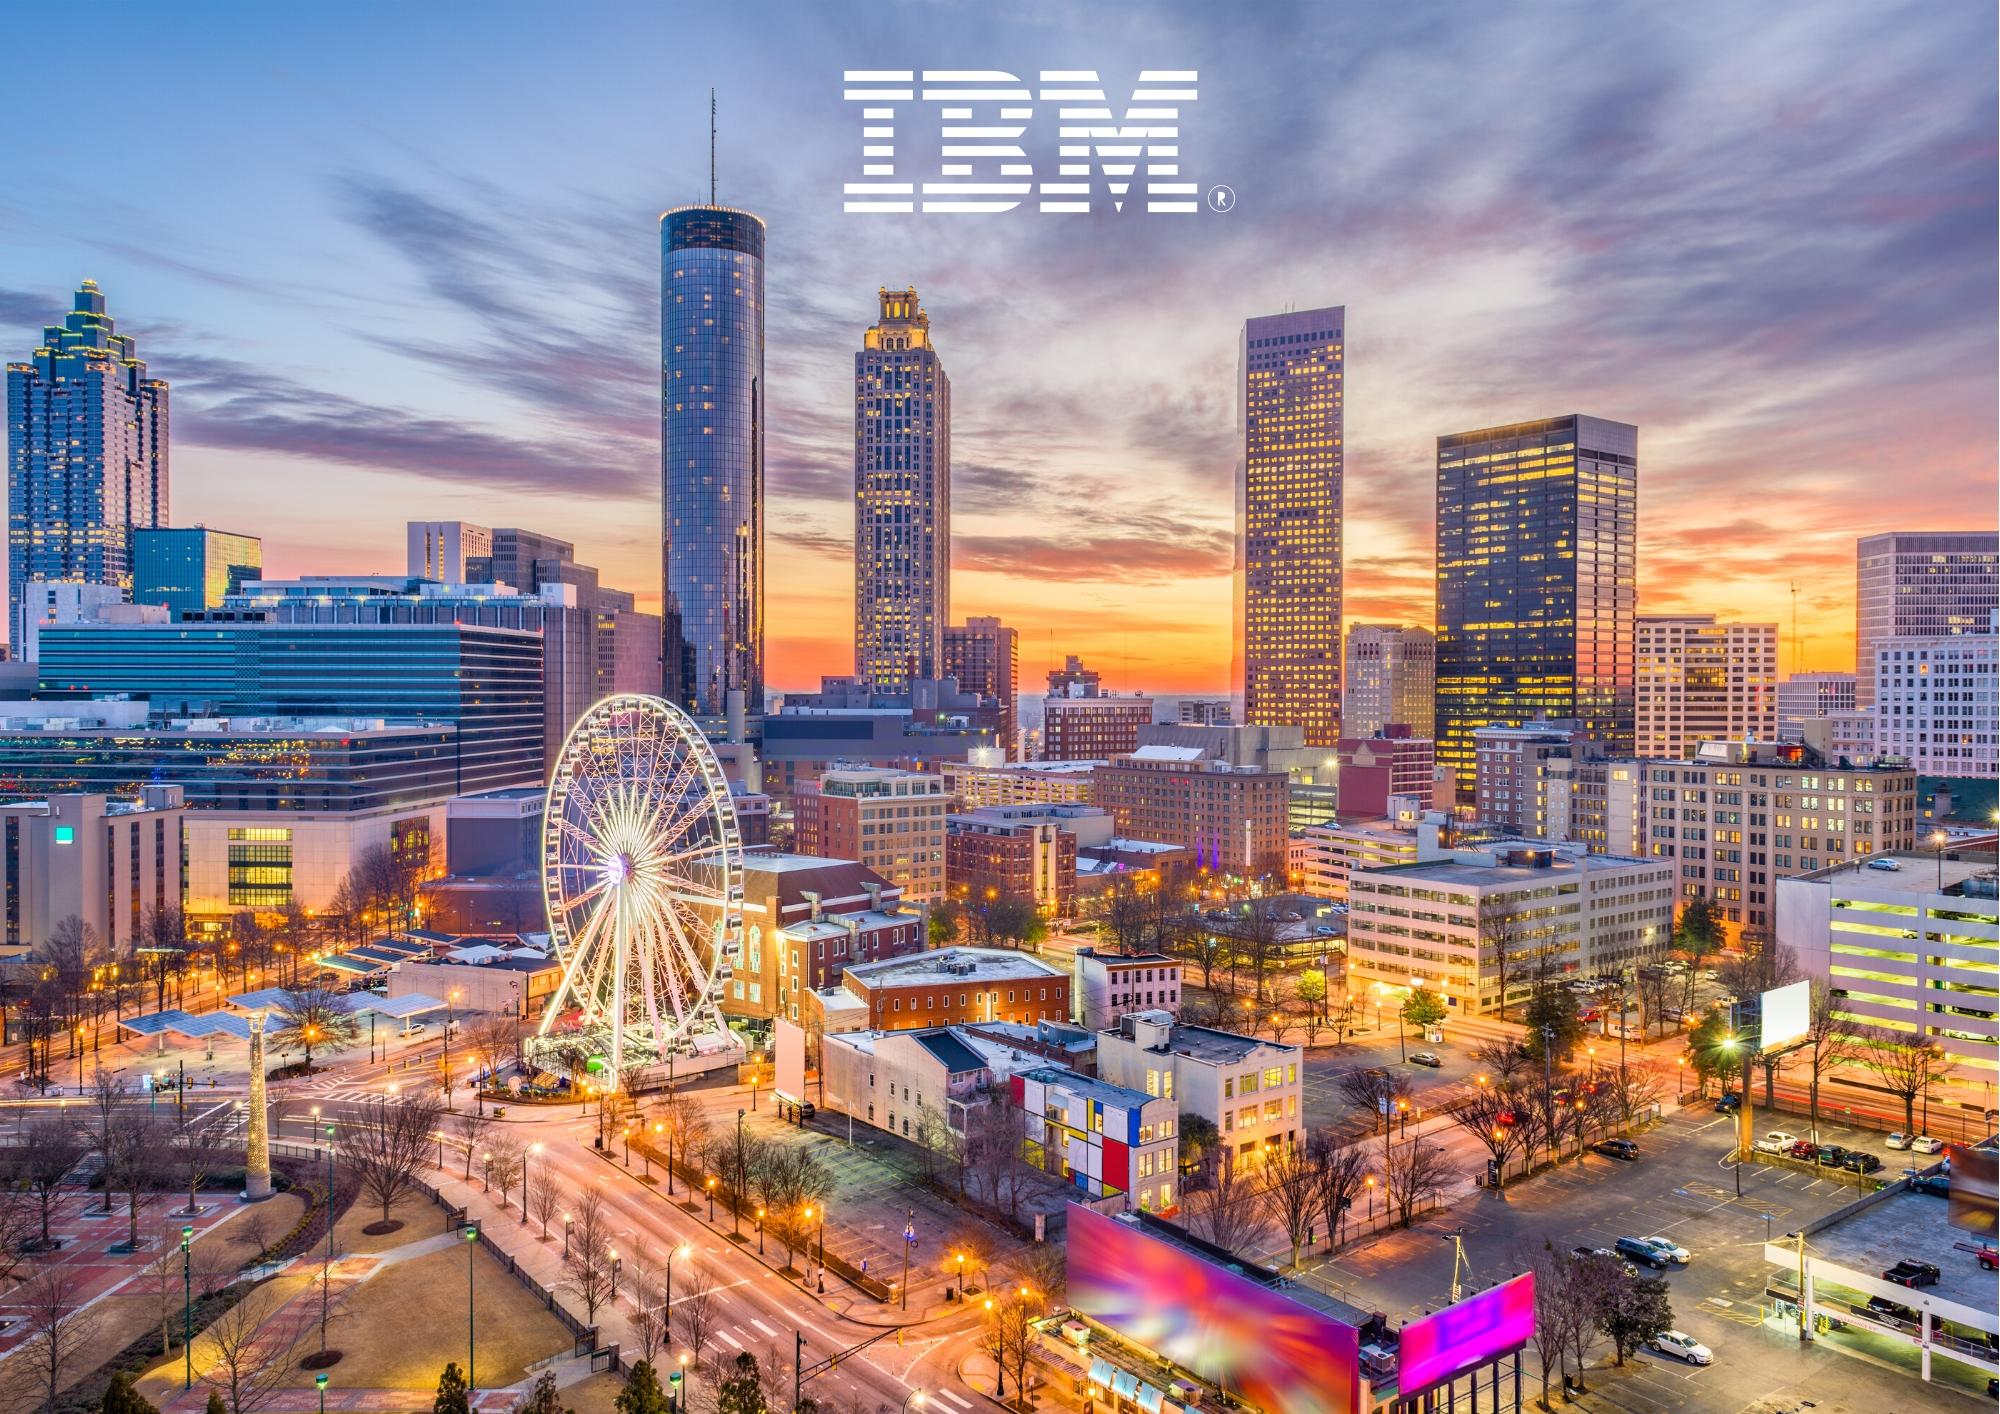 website event listing images - IBM Atlanta